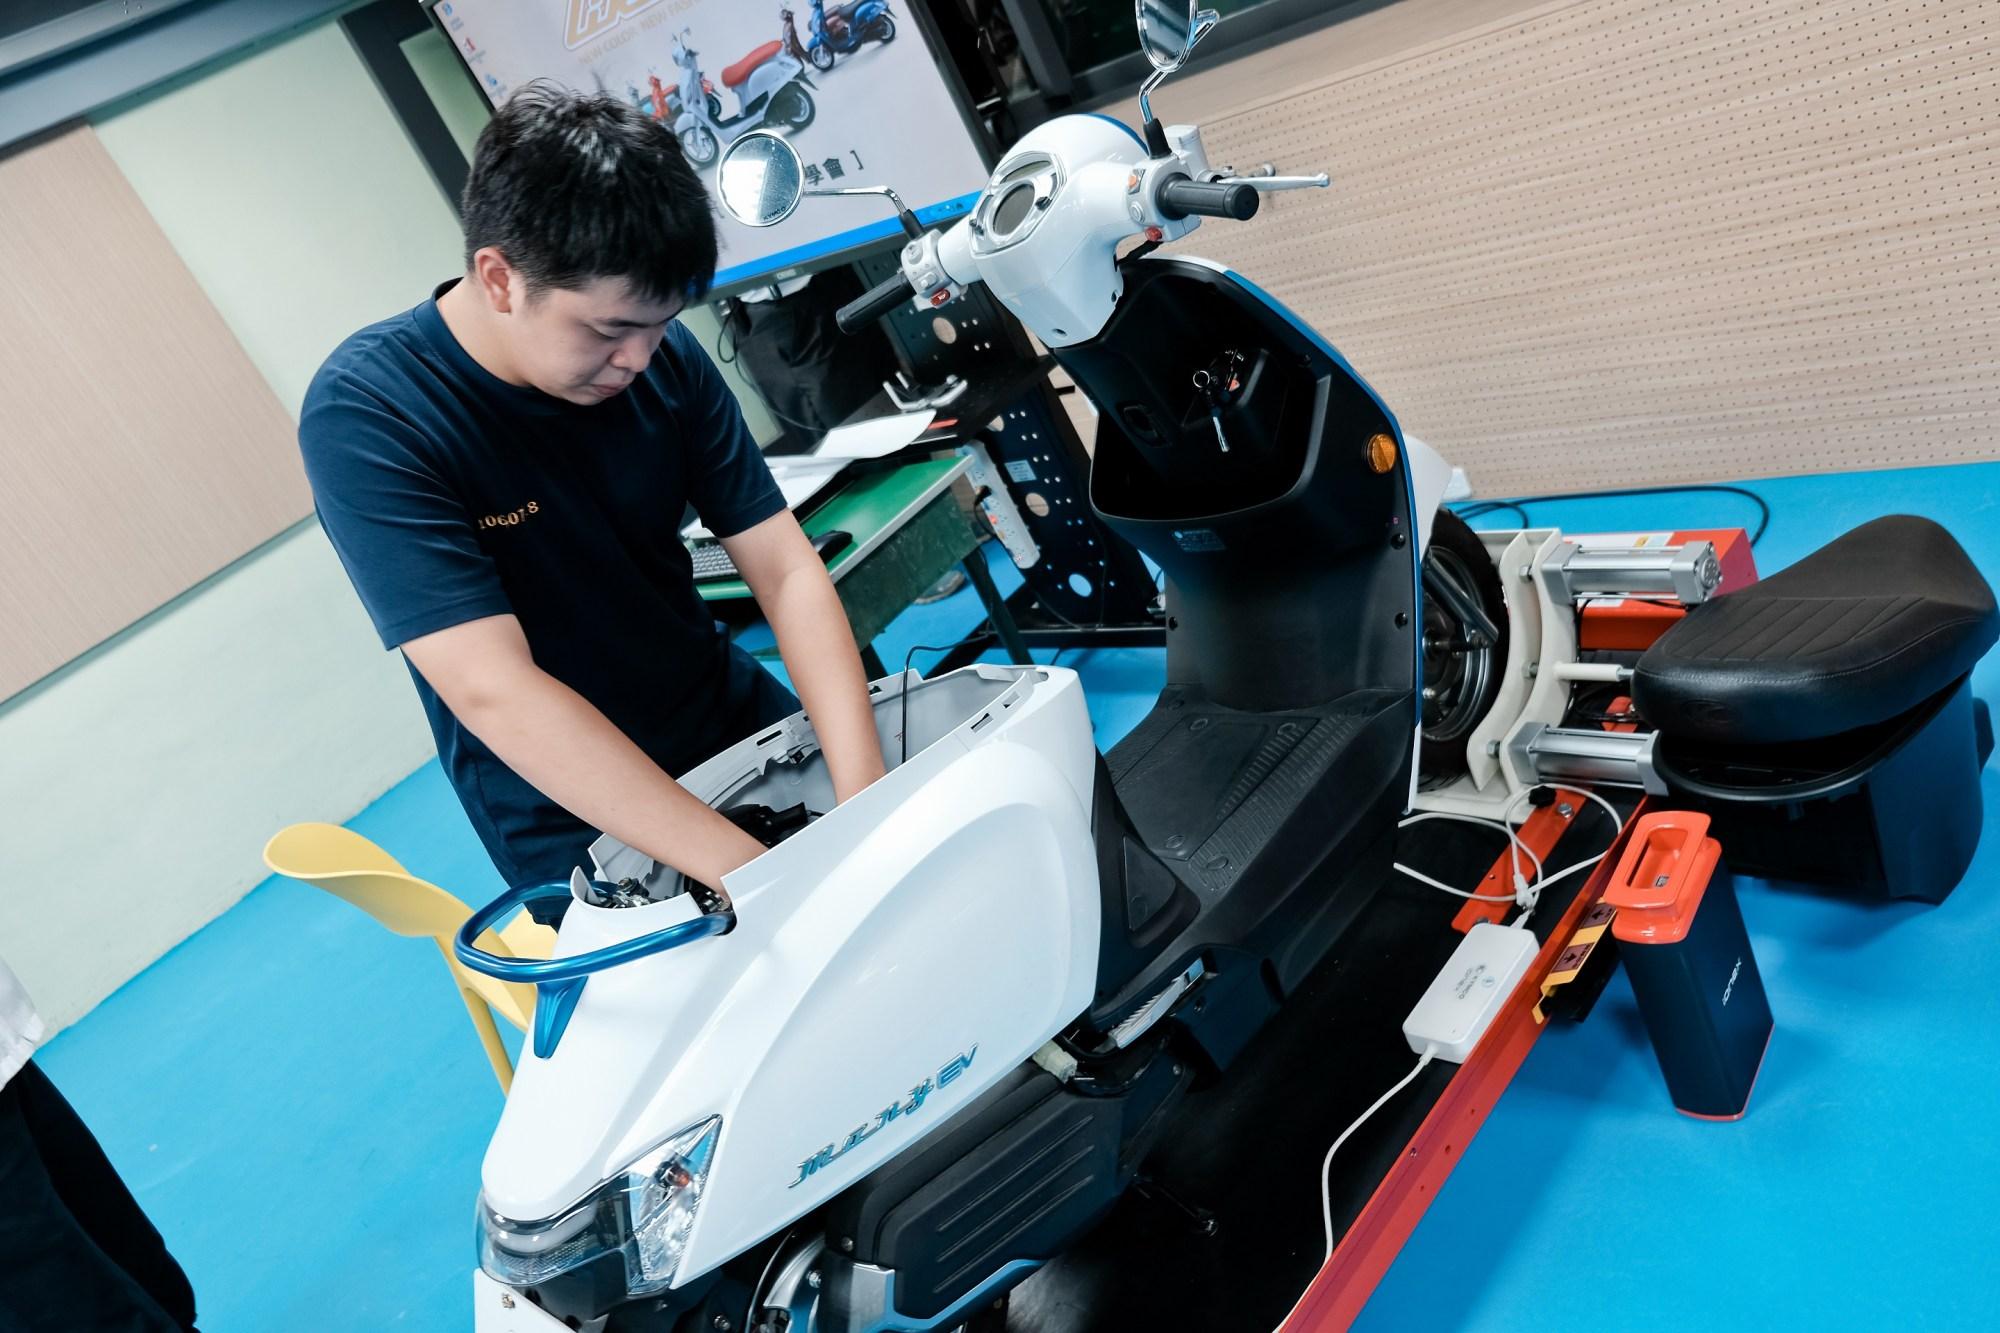 KYMCO接軌未來趨勢,積極扶植電動車人才「油電並行」技術優勢,讓新型環保機車同為環保先鋒與市場主流。.jpg